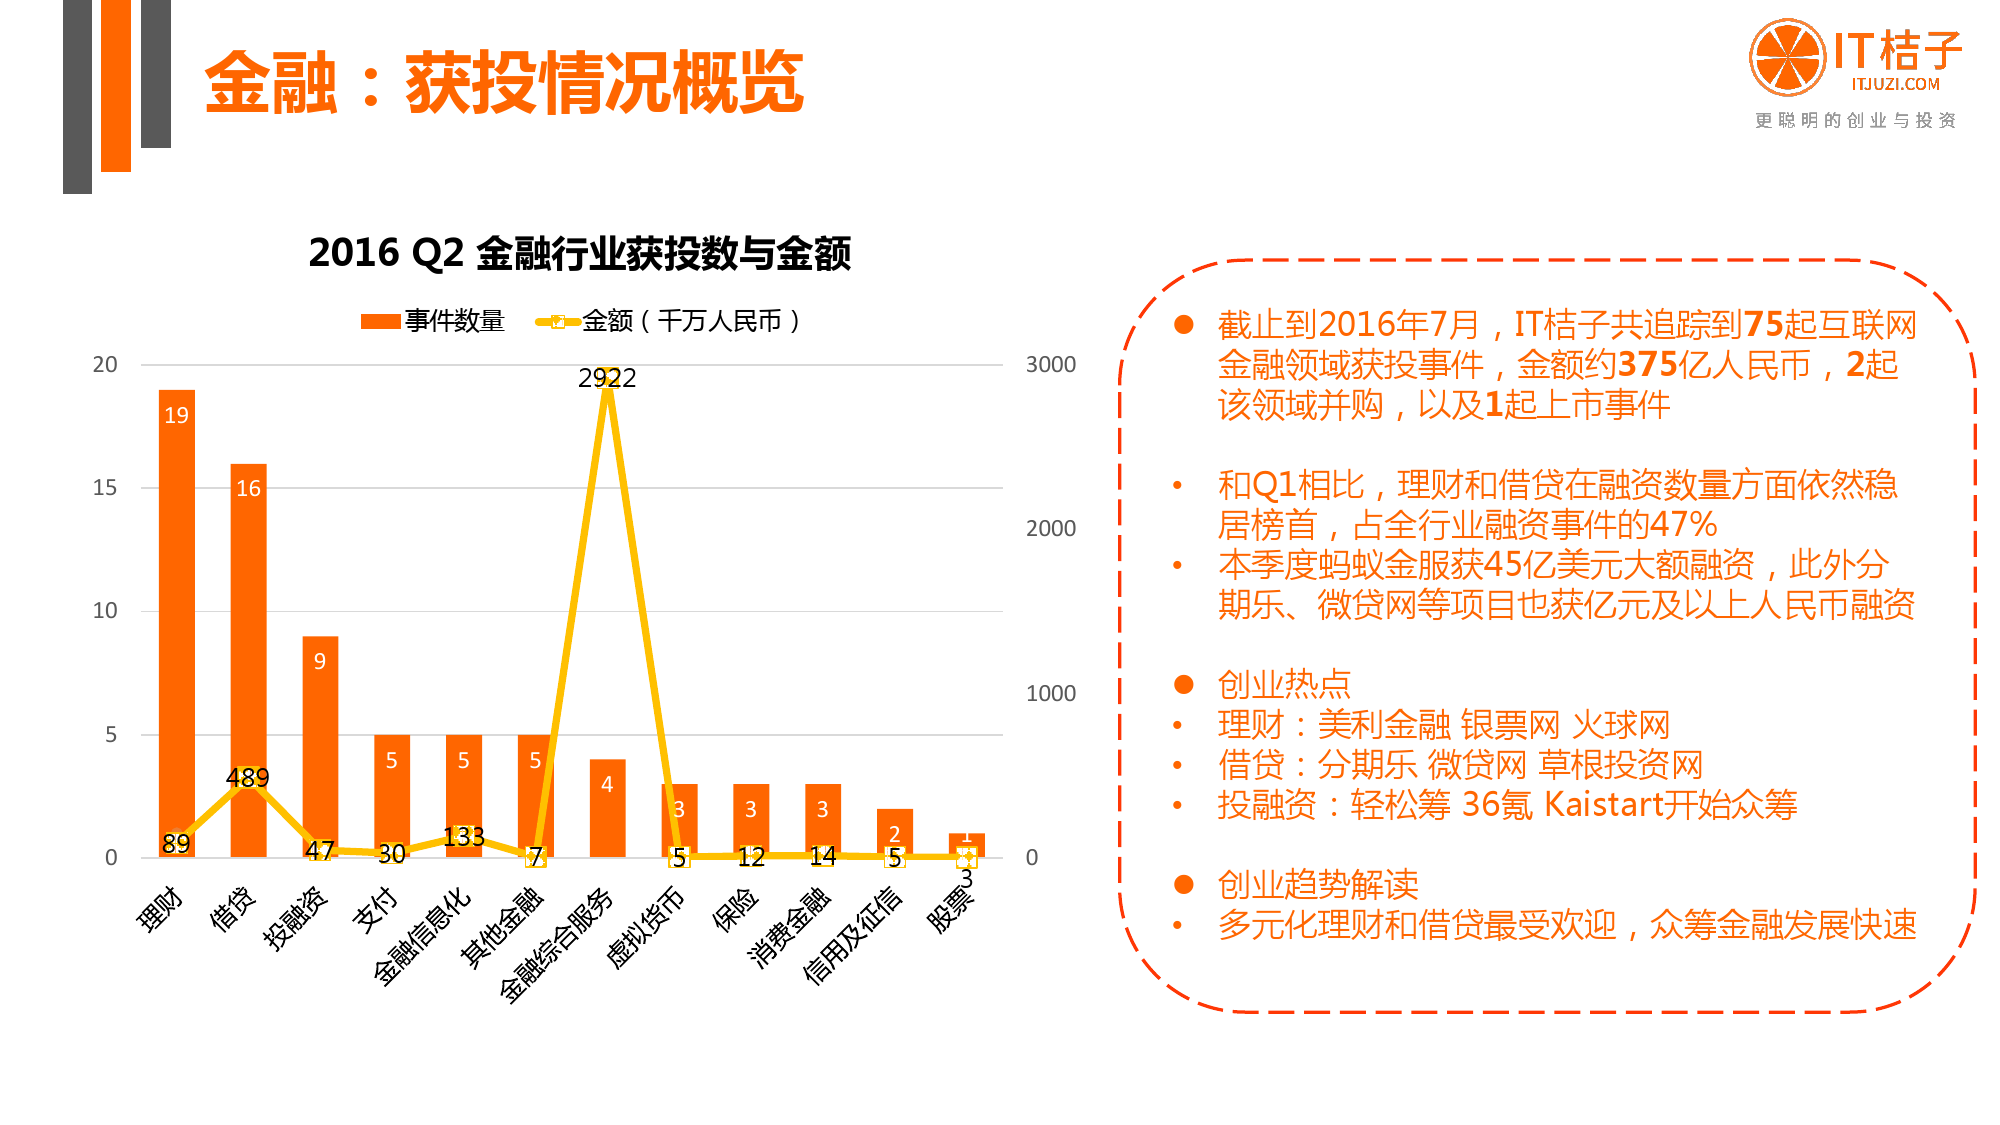 【IT桔子】2016年Q2中国互联网创业投资分析报告_000038